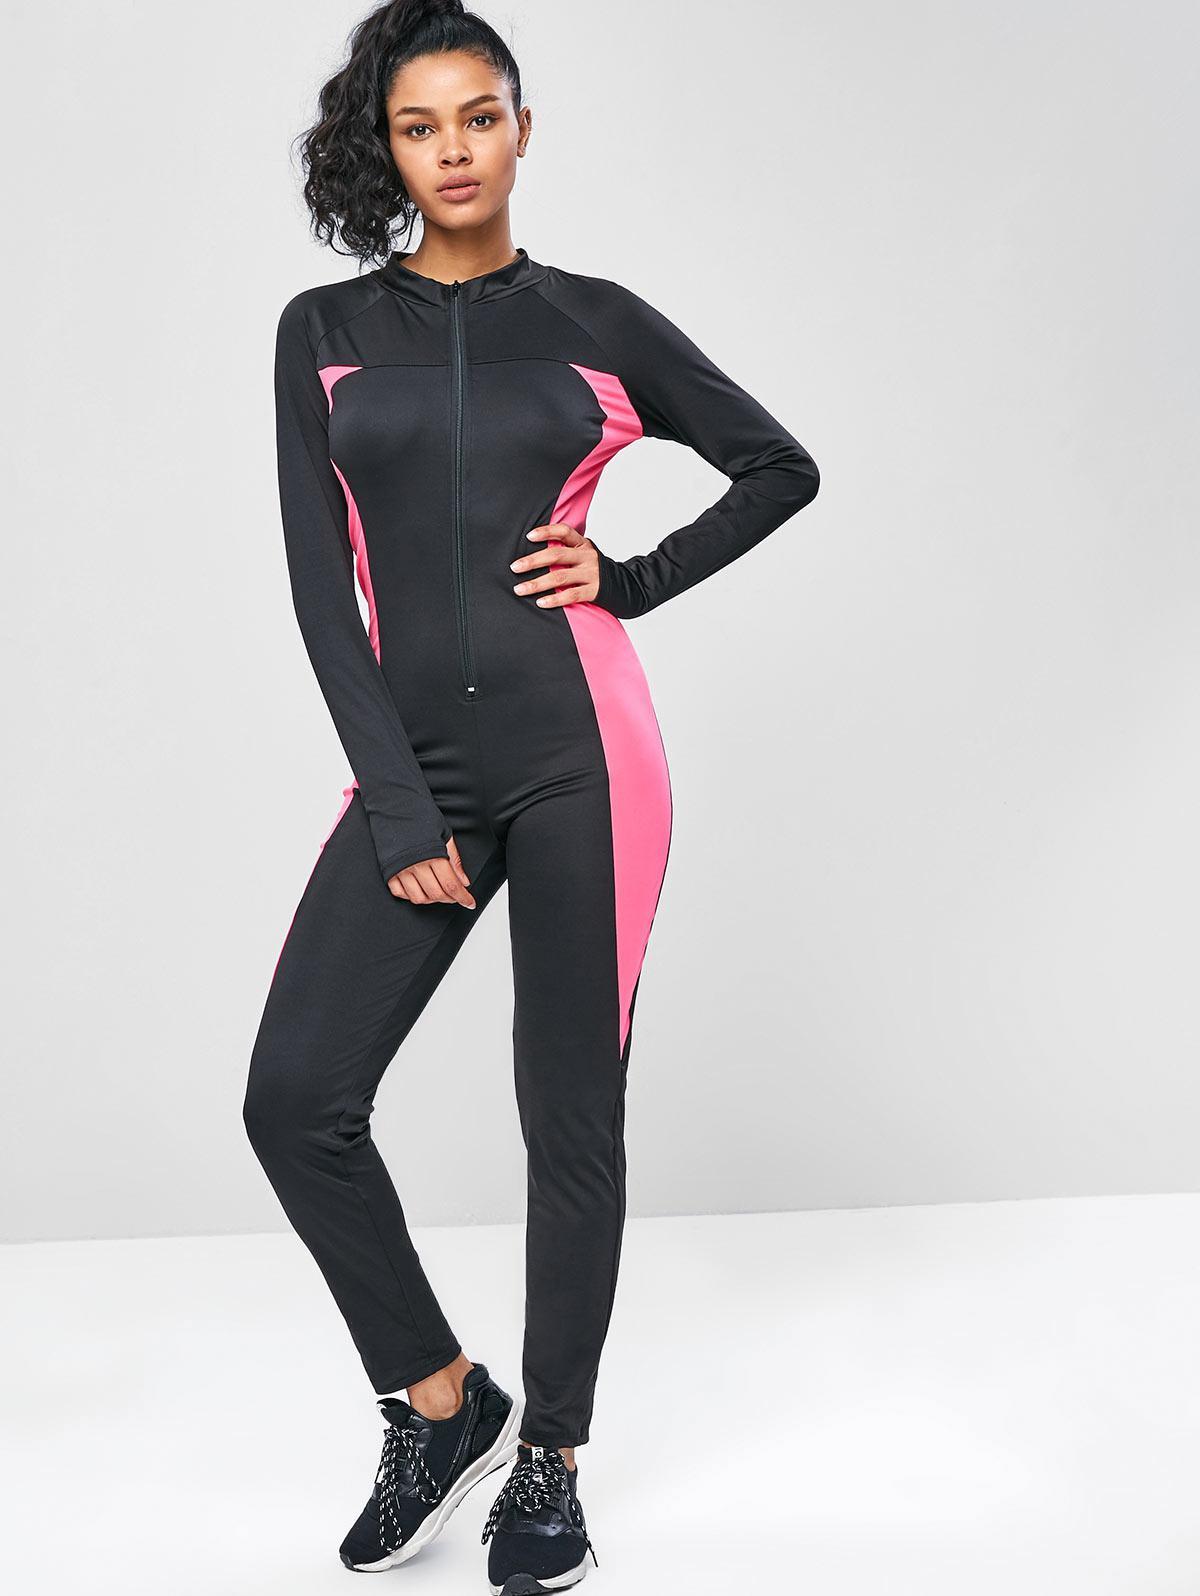 Long Sleeve Zip Two Tone Gym Jumpsuit, Black